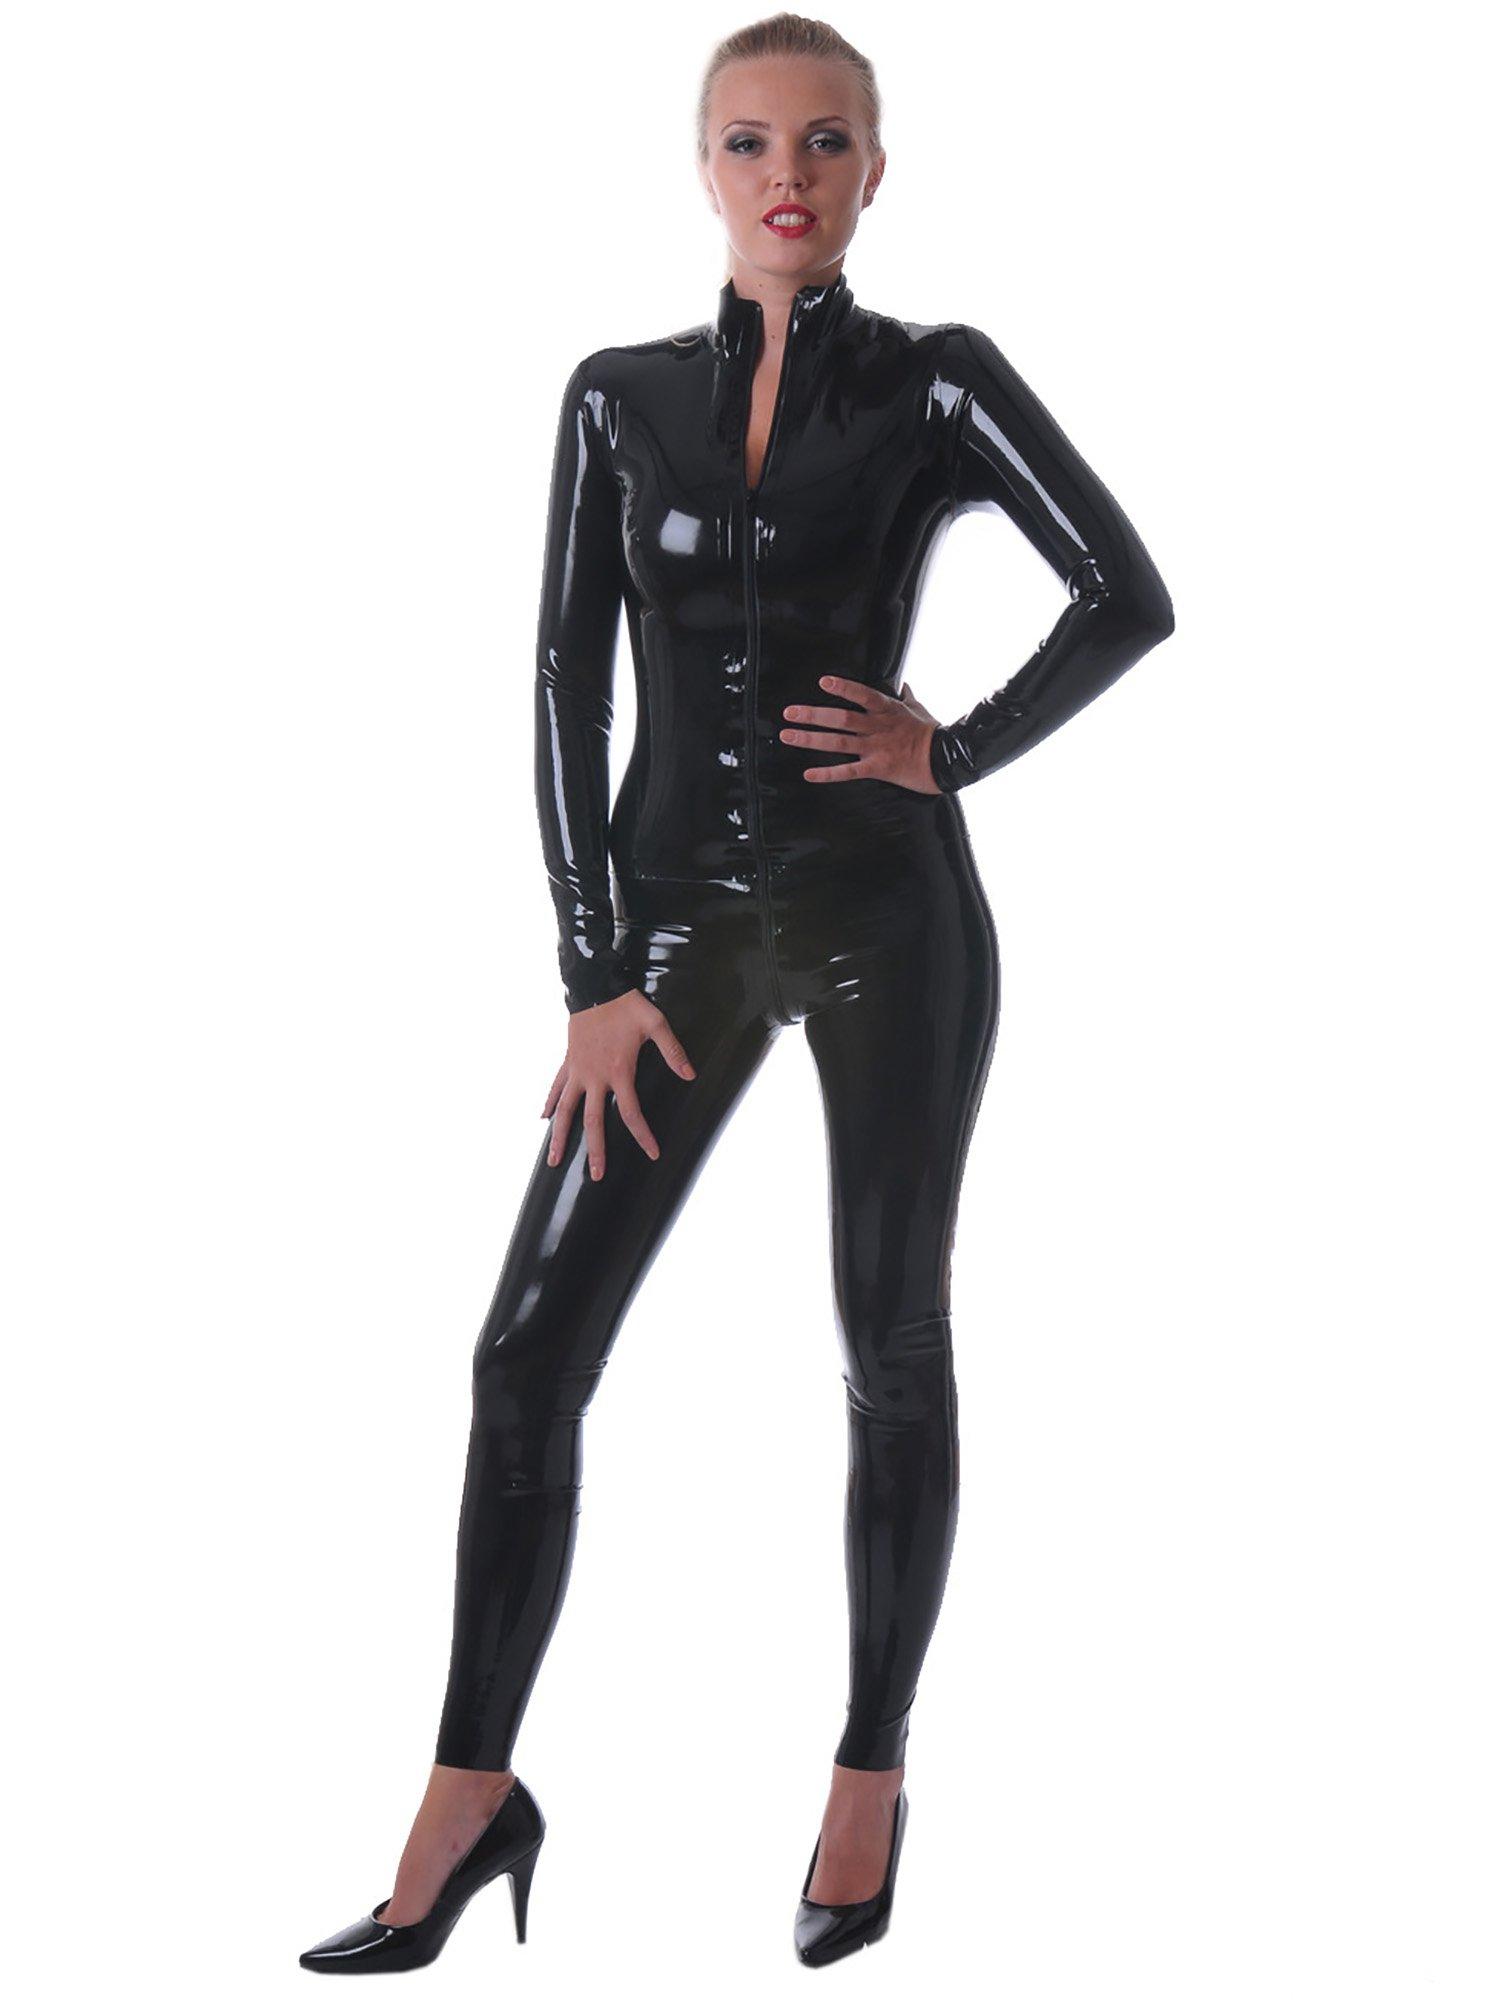 Honour Women's Catsuit in Rubber Black size UK 16 (XL)